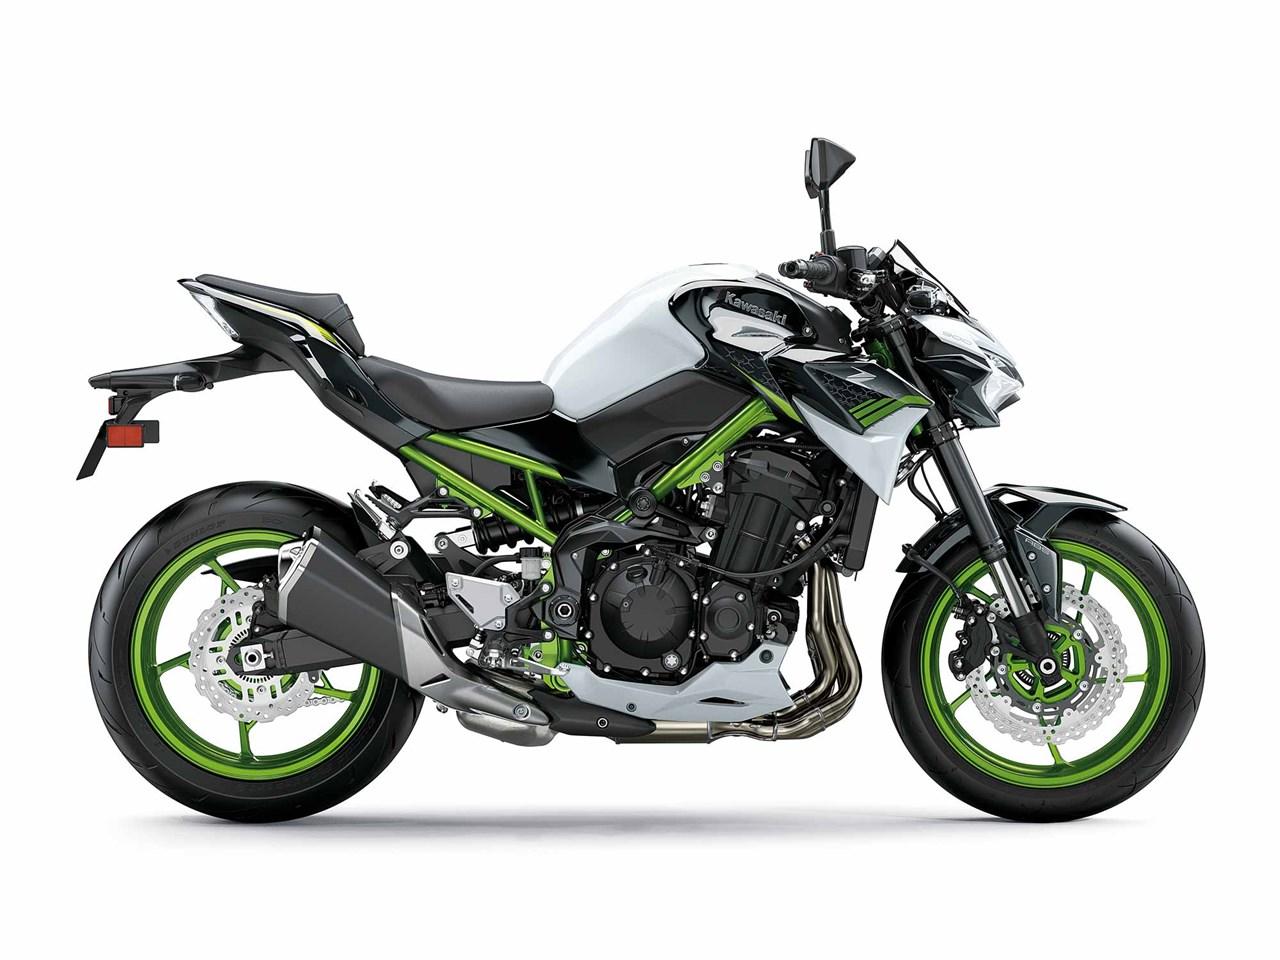 Kawasaki Z H2 & Ninja 1000SX Launching In Japan On April 4